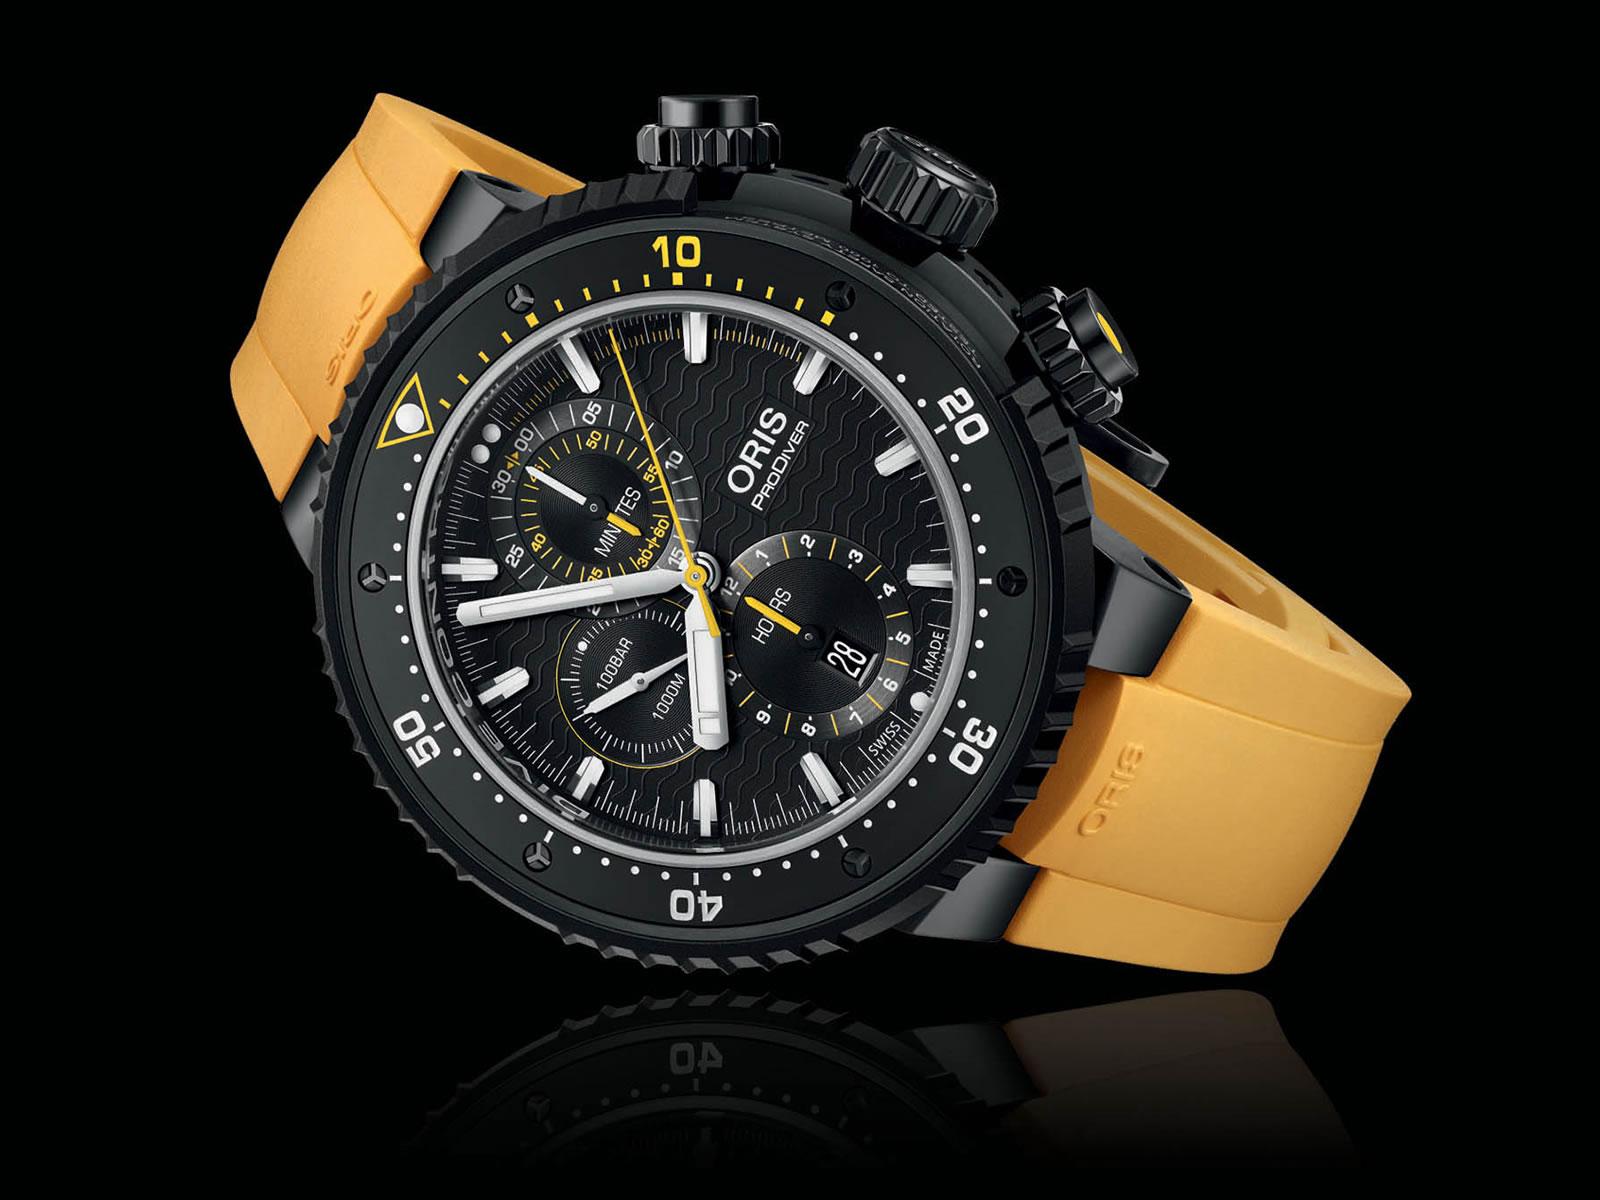 01-774-7727-7784-set-oris-prodiver-dive-control-chronograph-2-.jpg